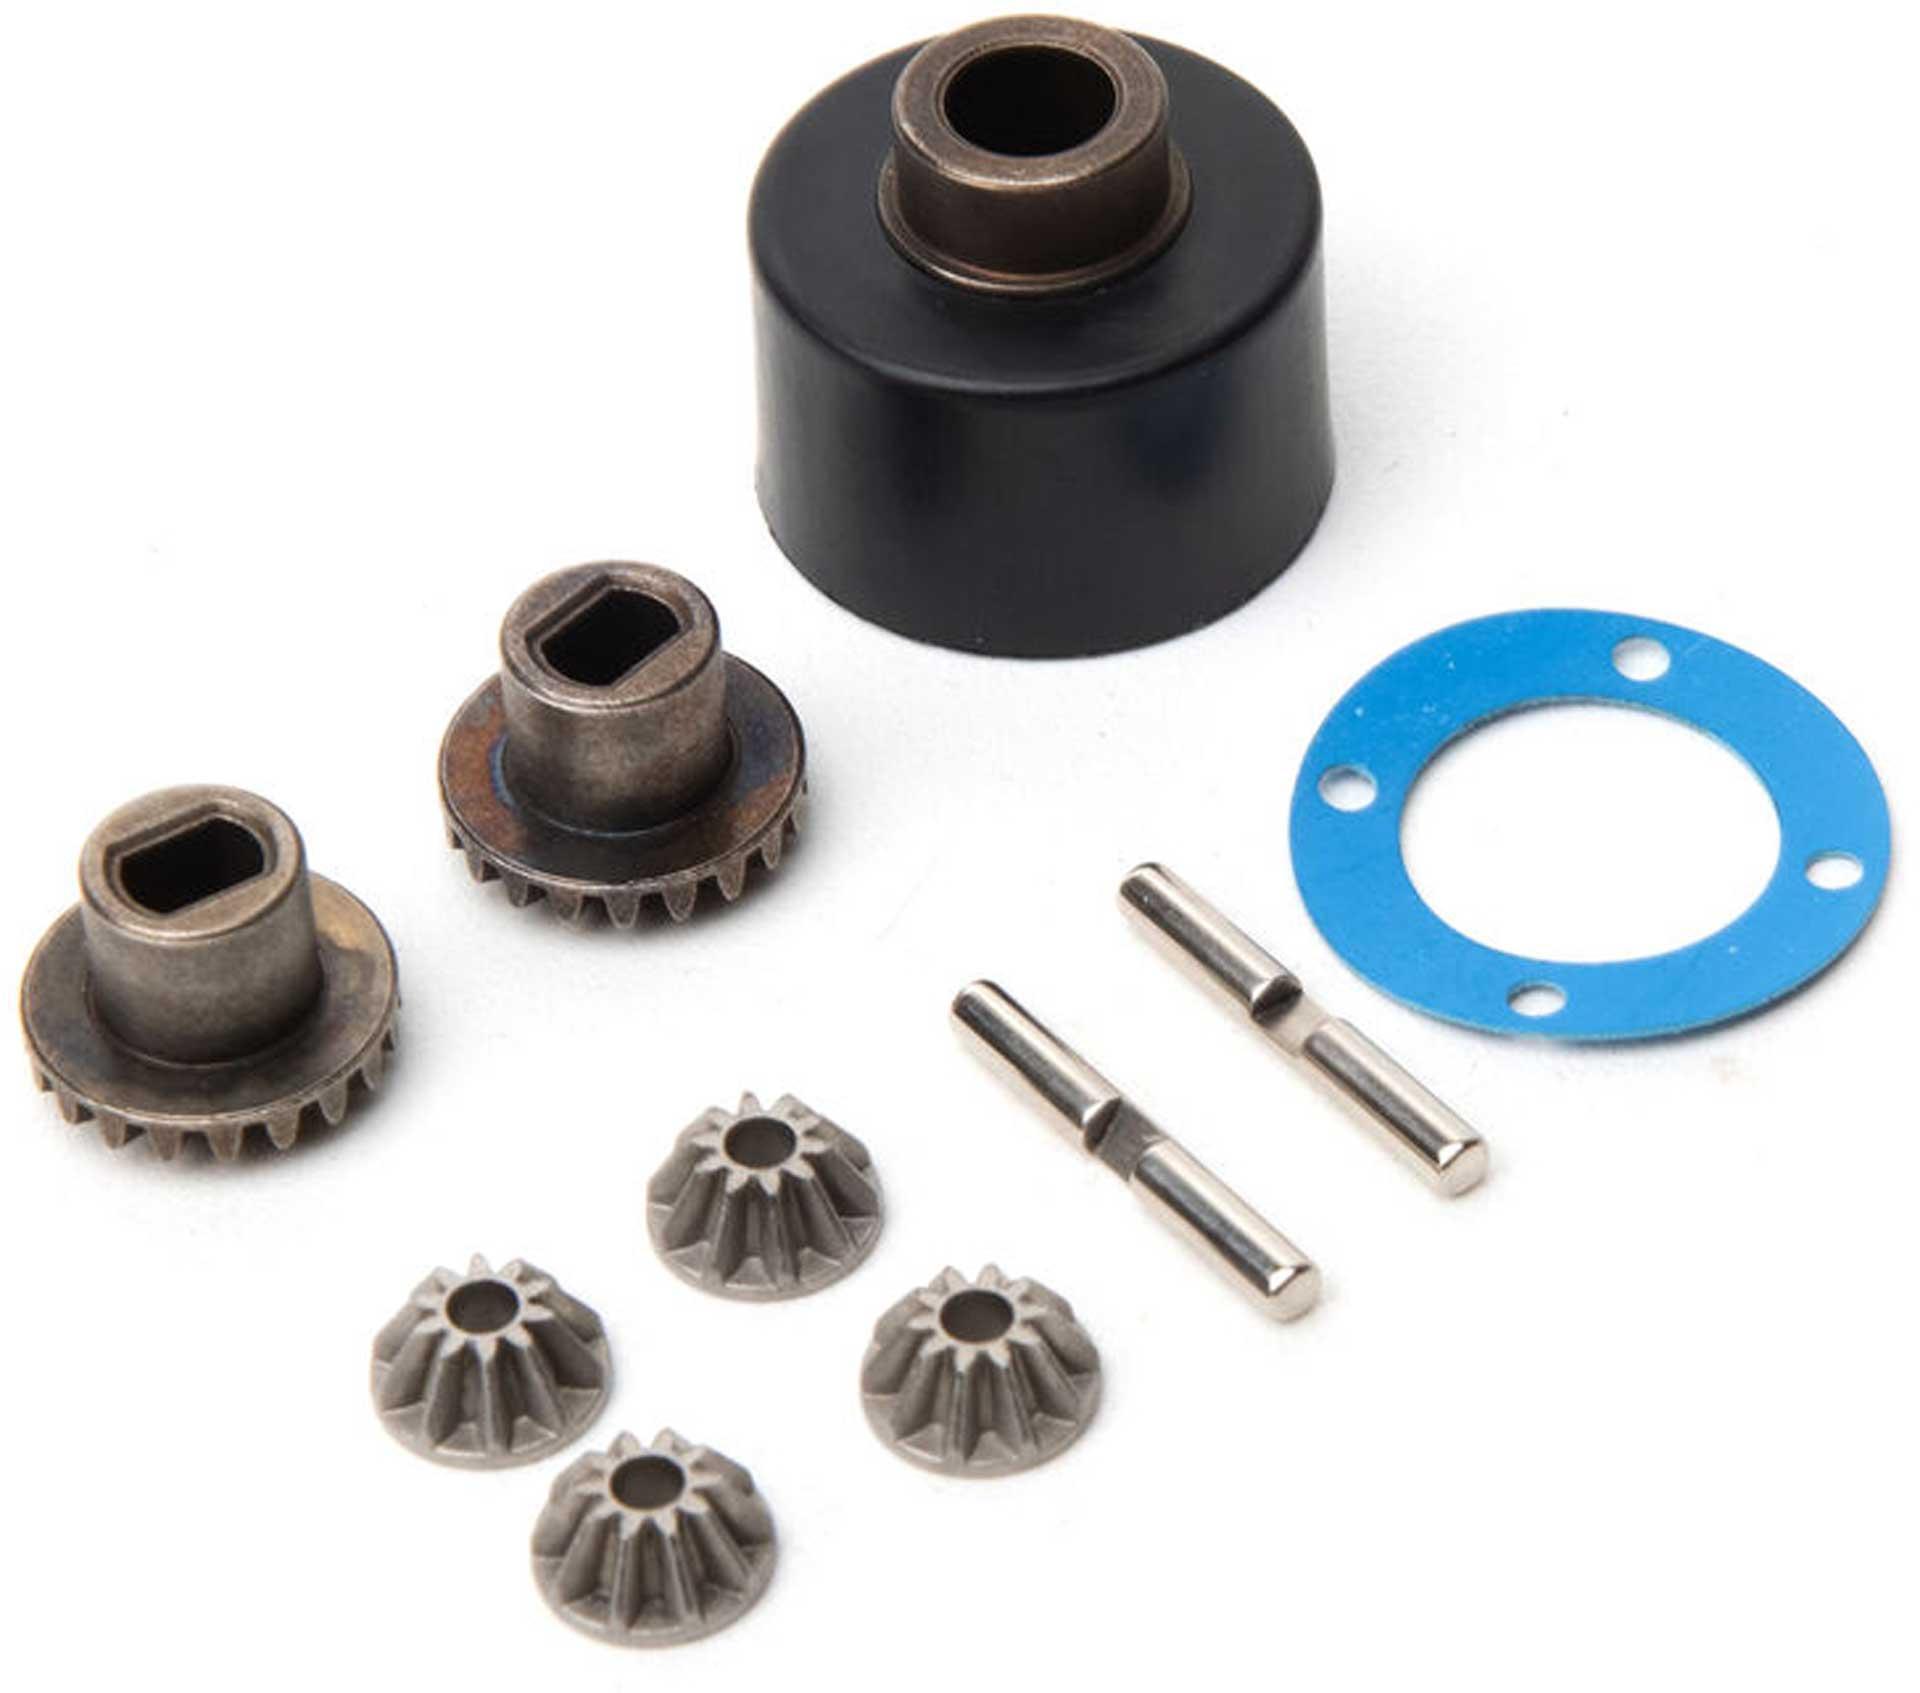 Axial Diff, Gears, Housing: RBX10